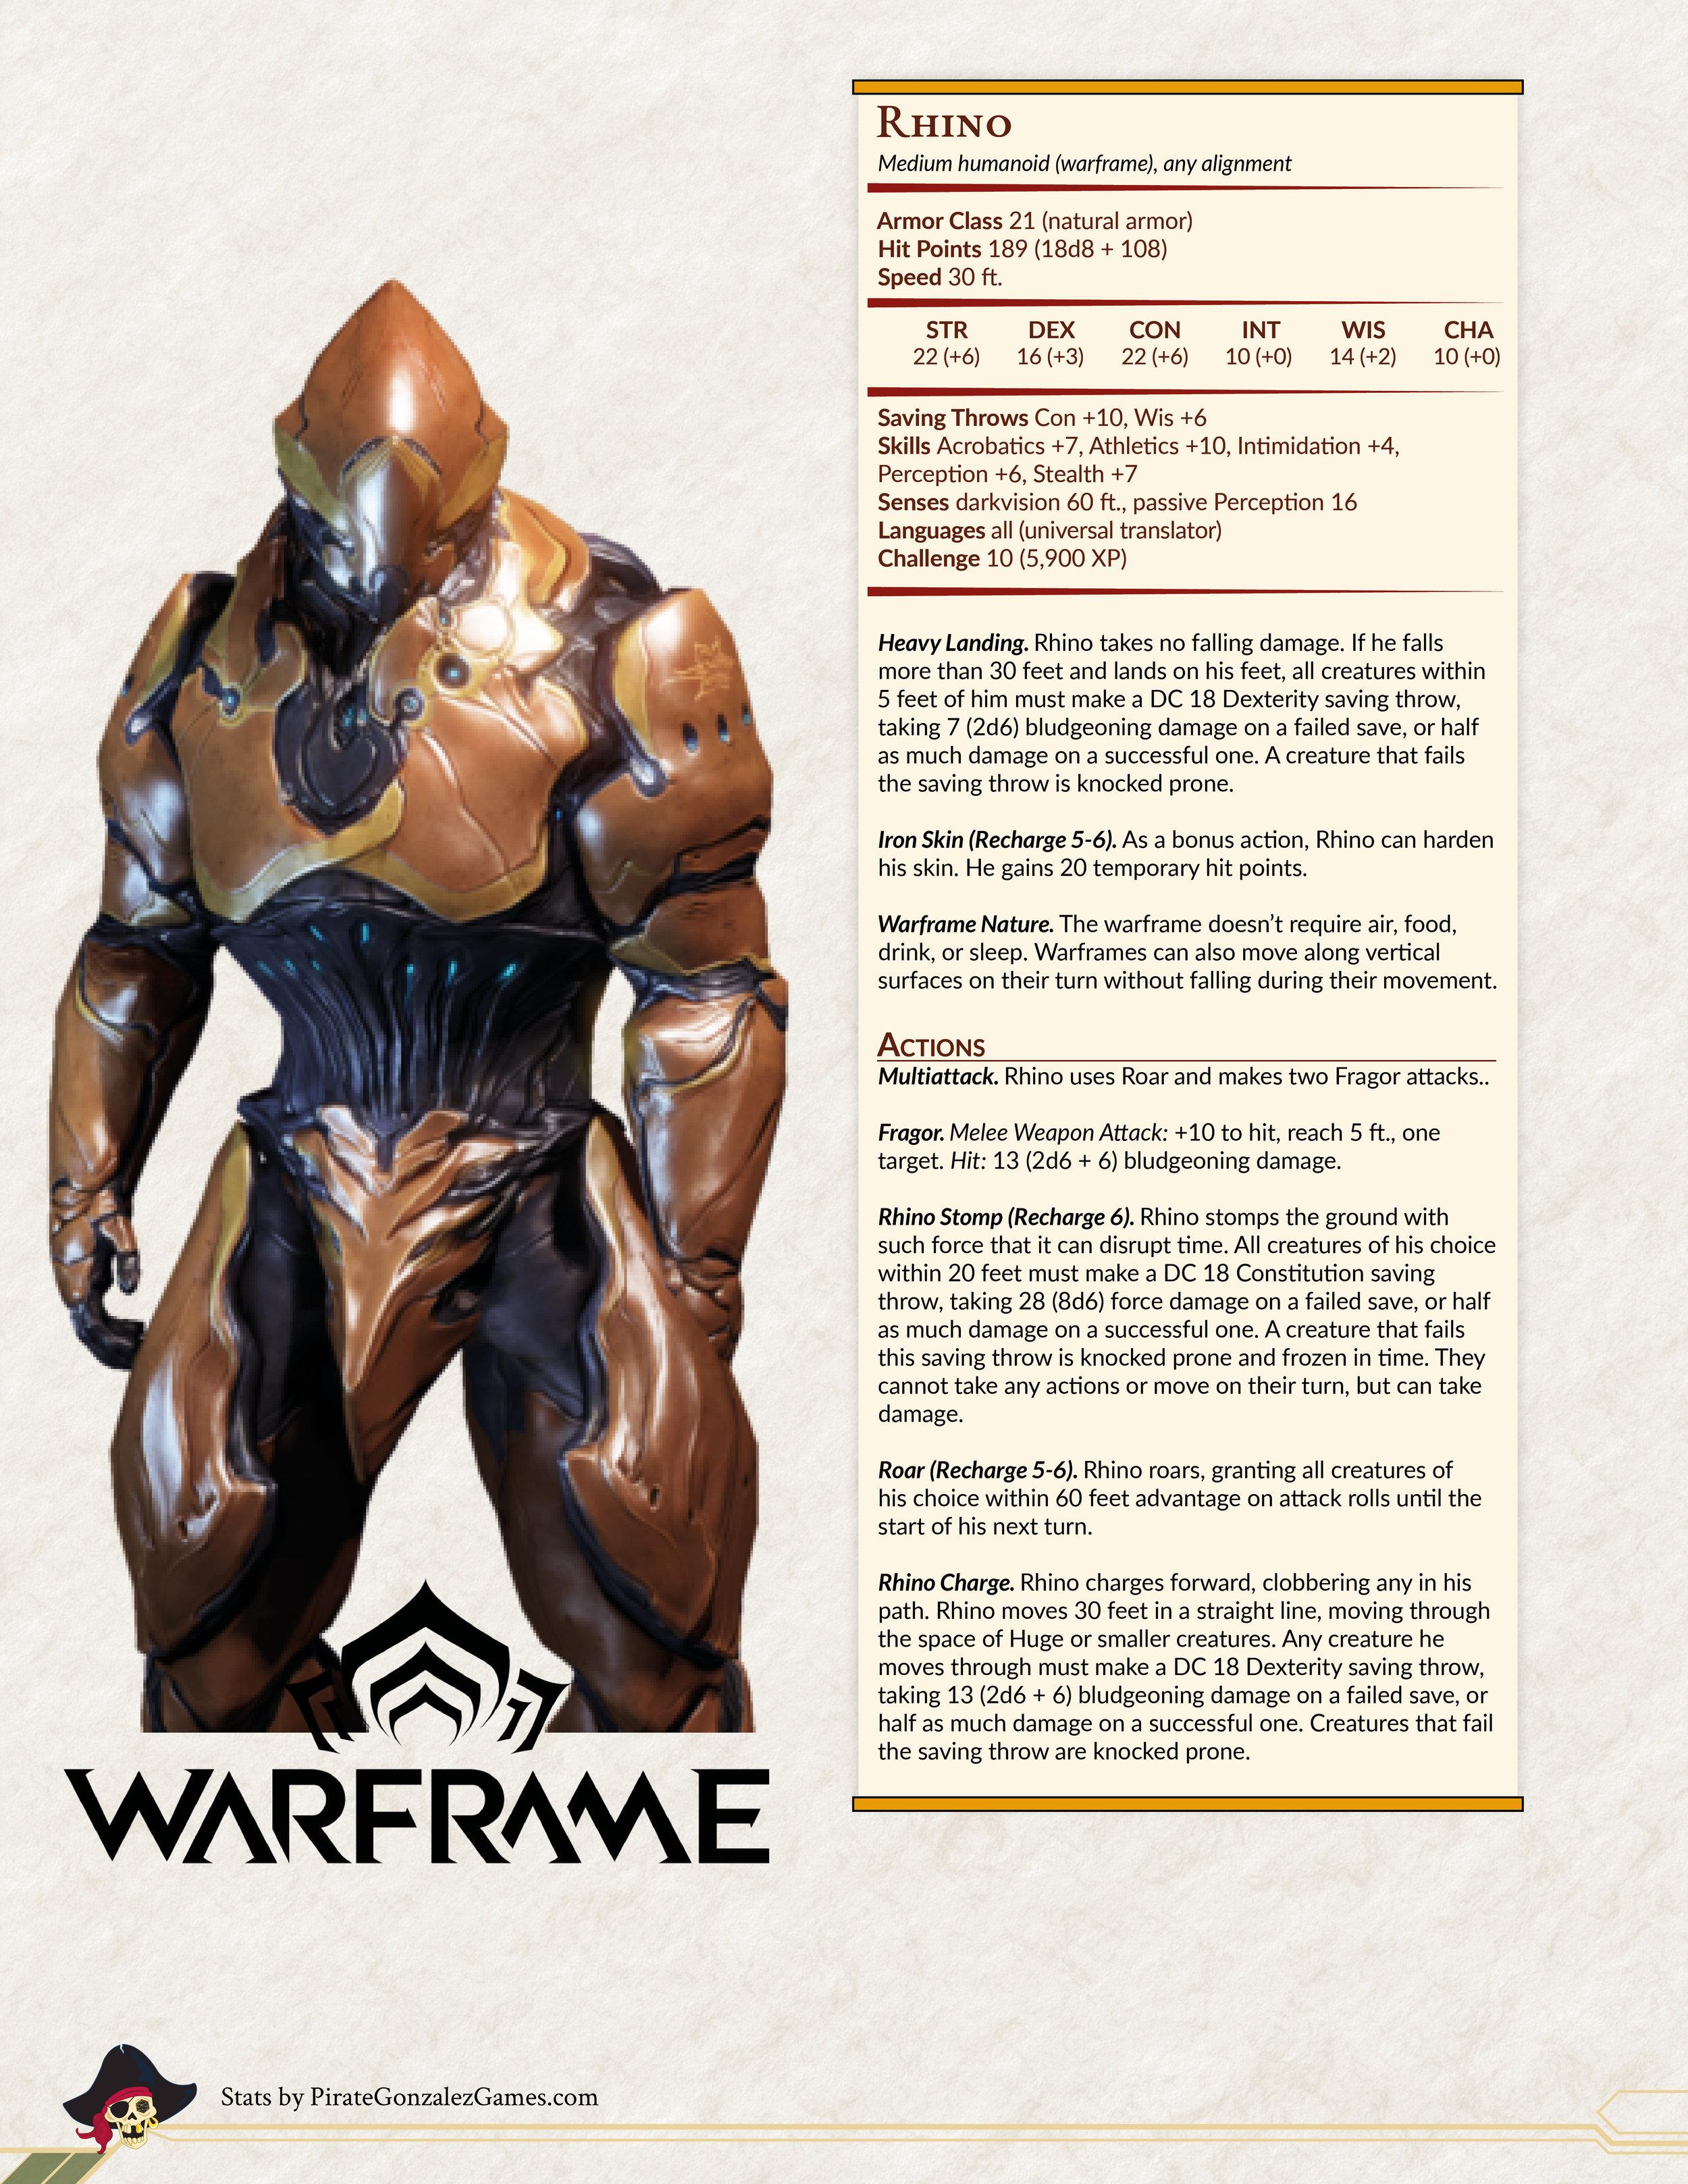 warframe, rhino2.jpg